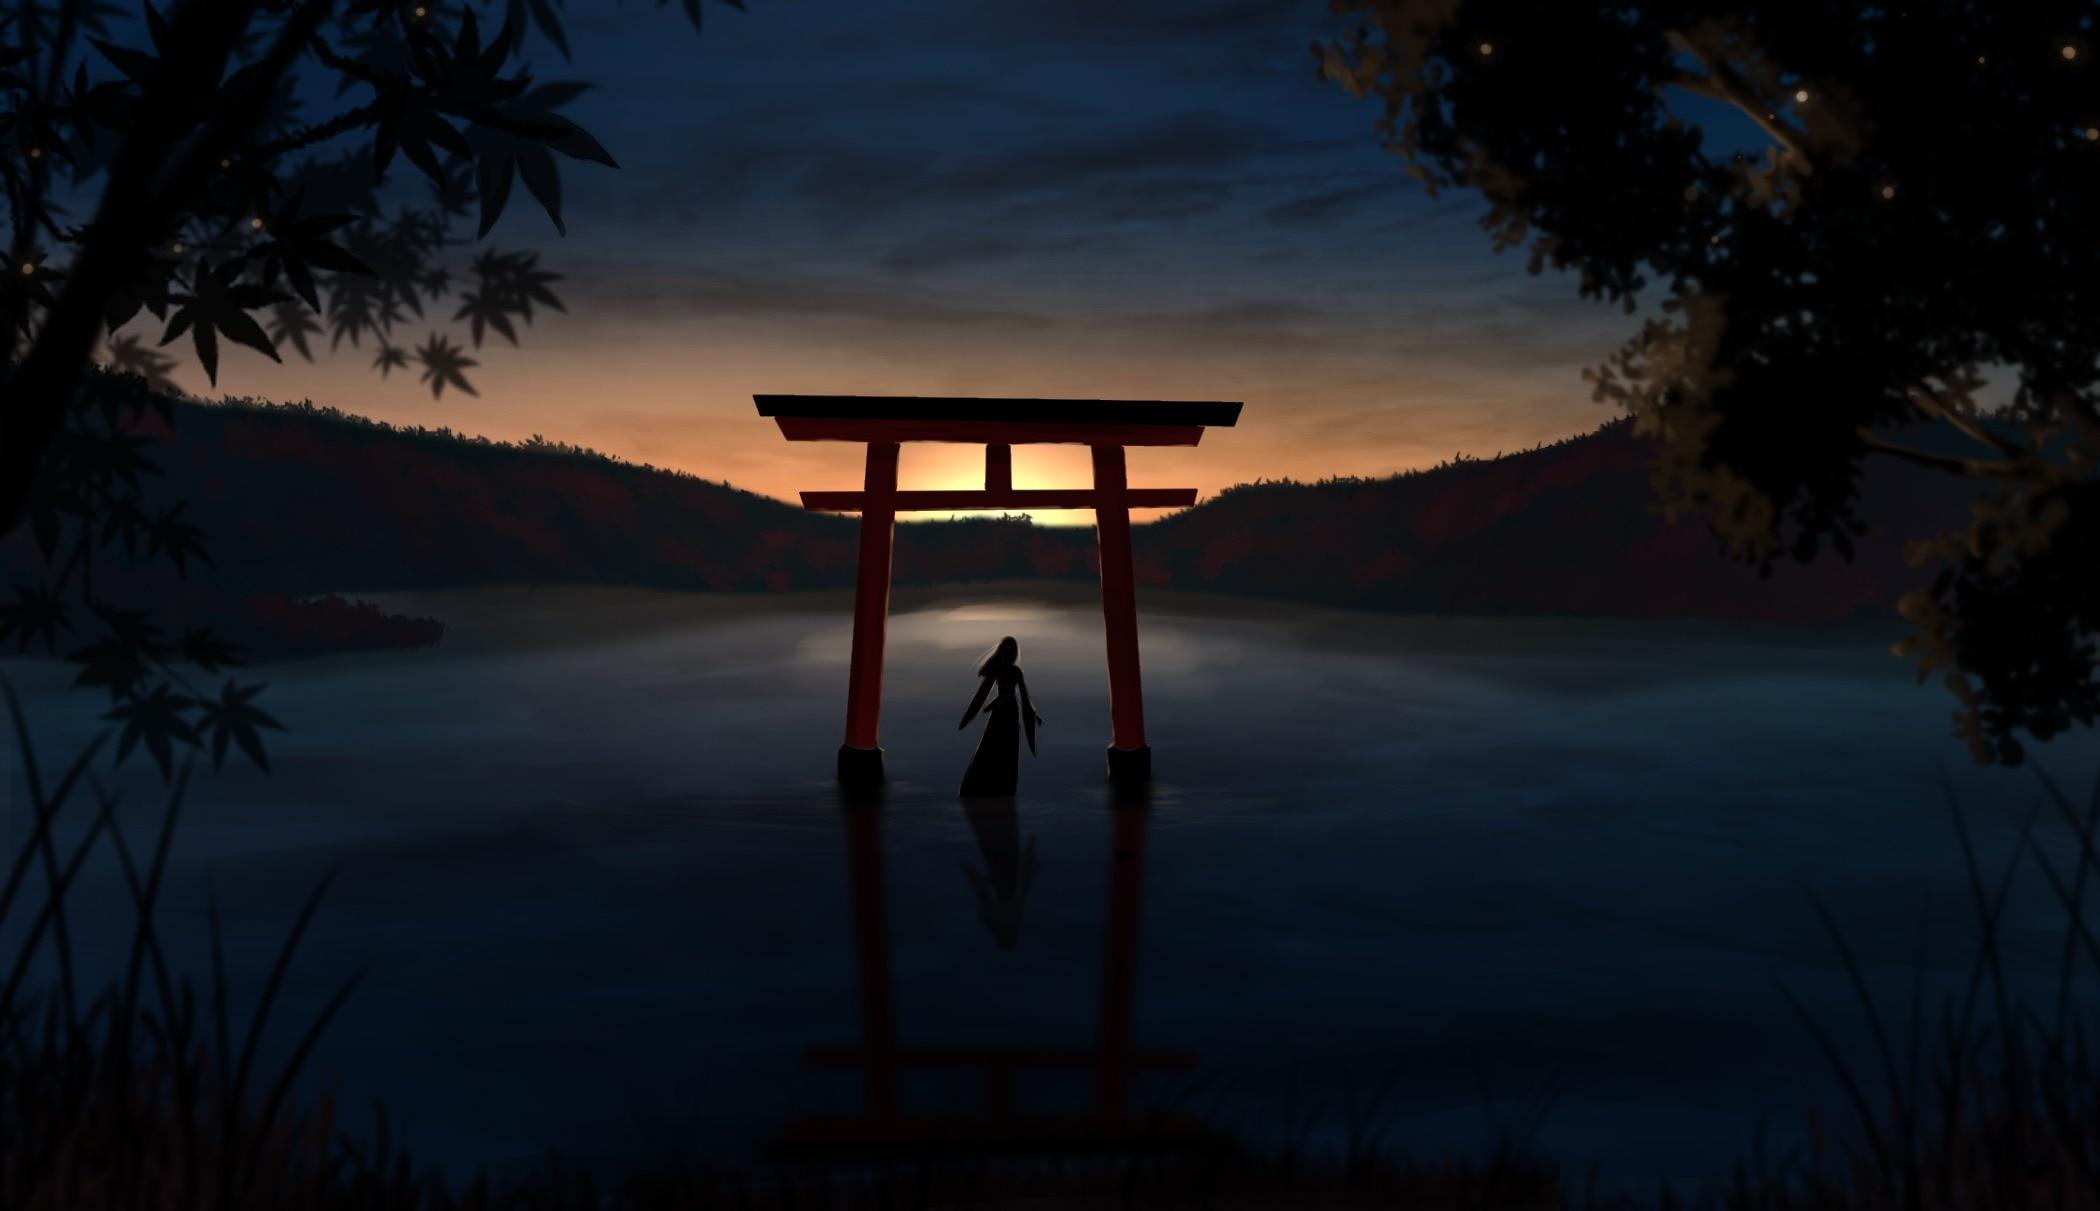 【P站画师】日本画师adsuger的风景插画作品- ACG17.COM